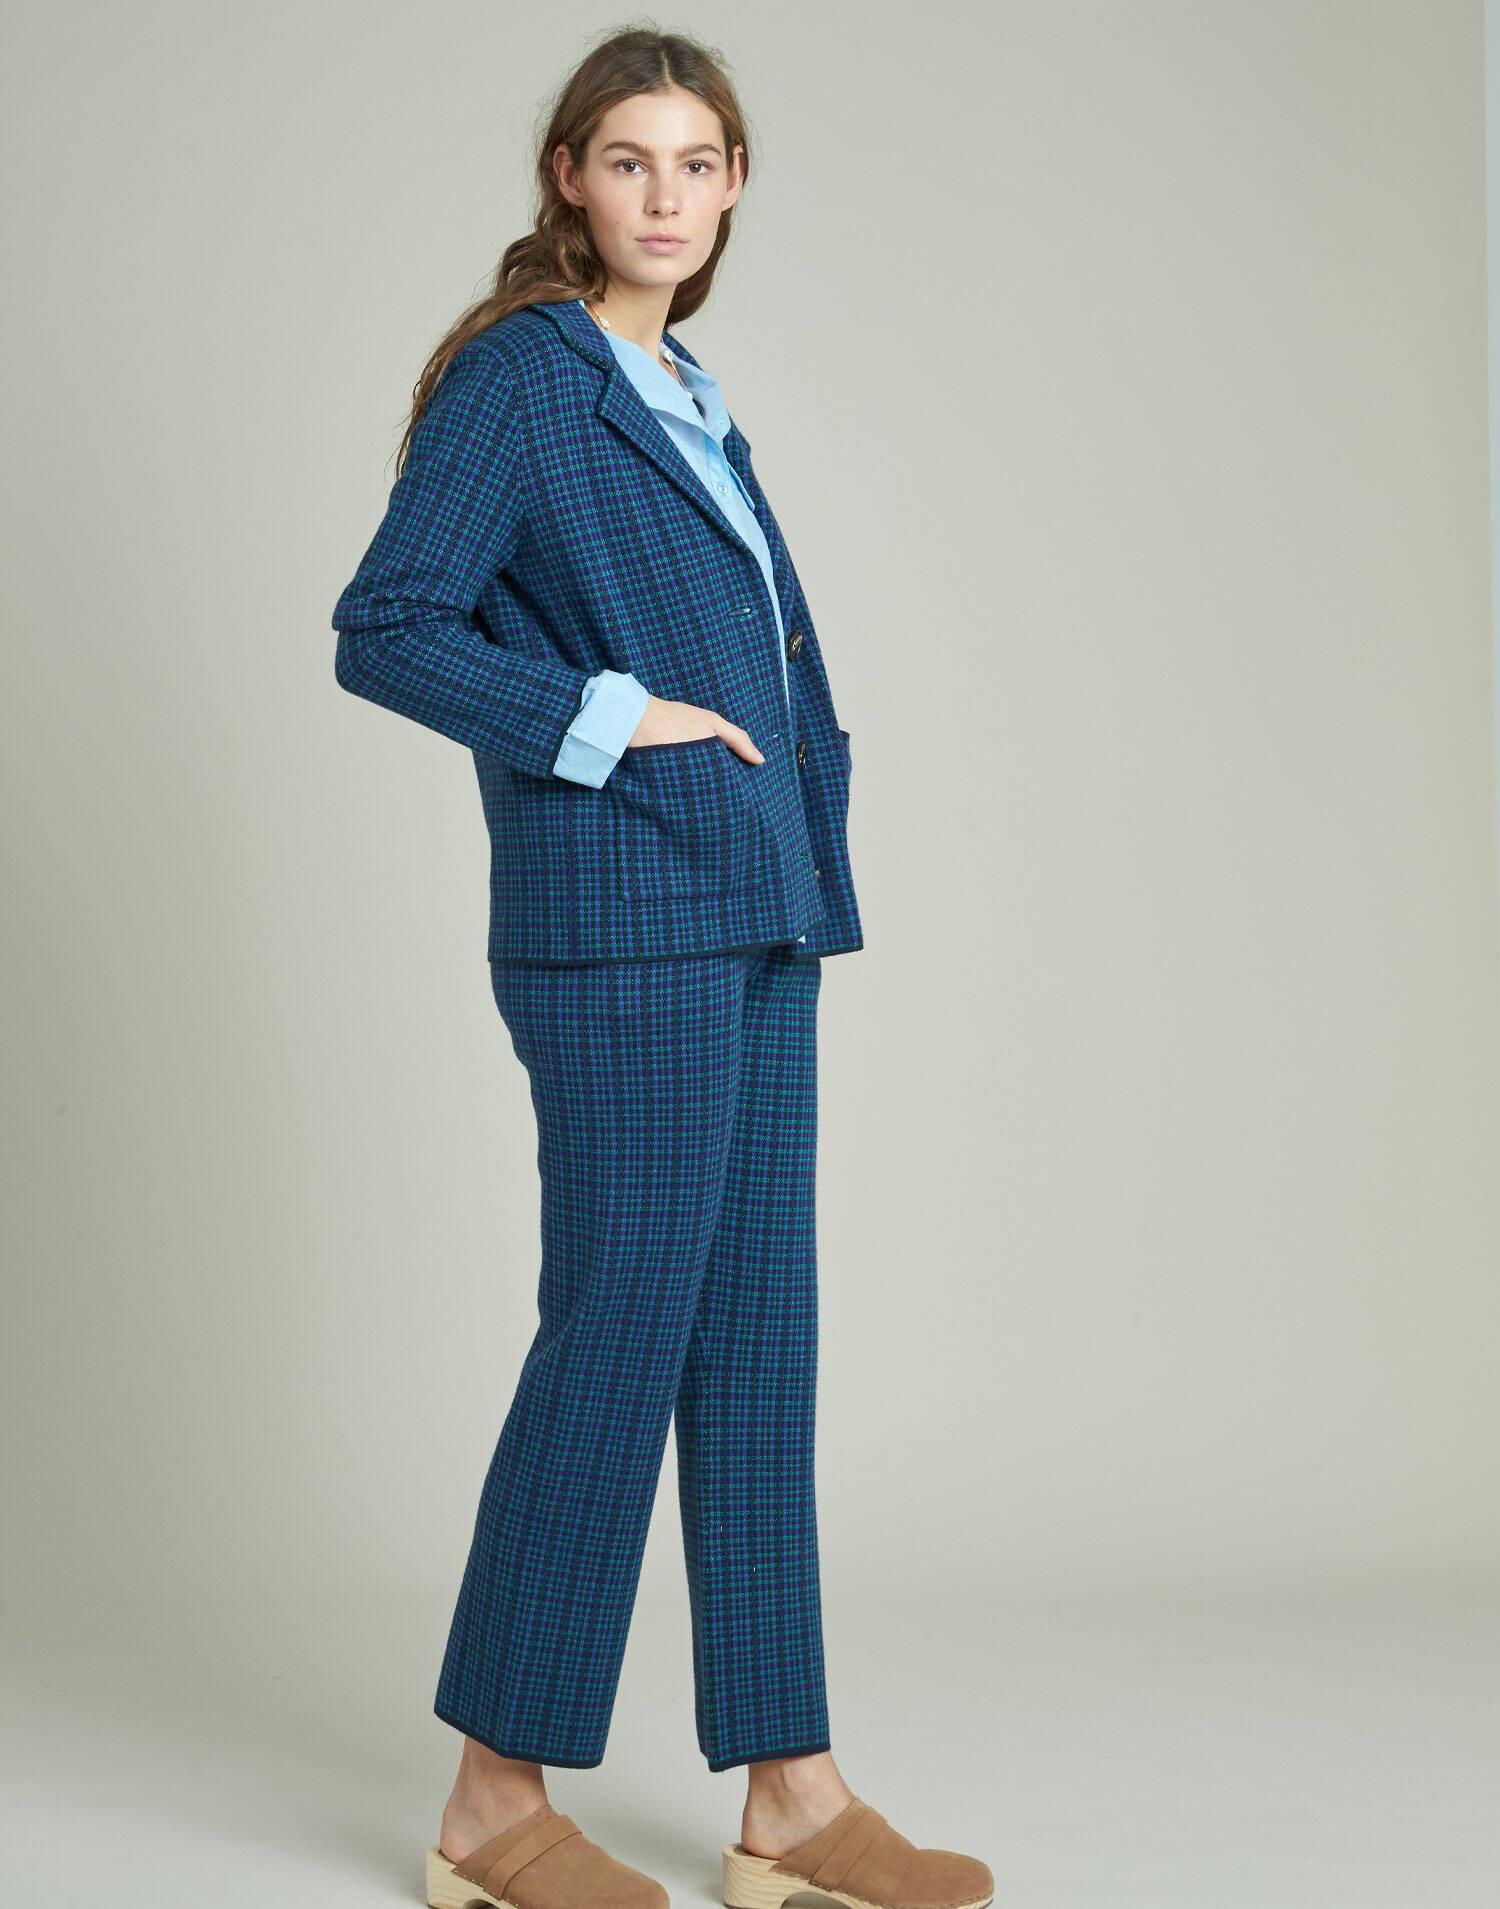 Tricot plaid pants